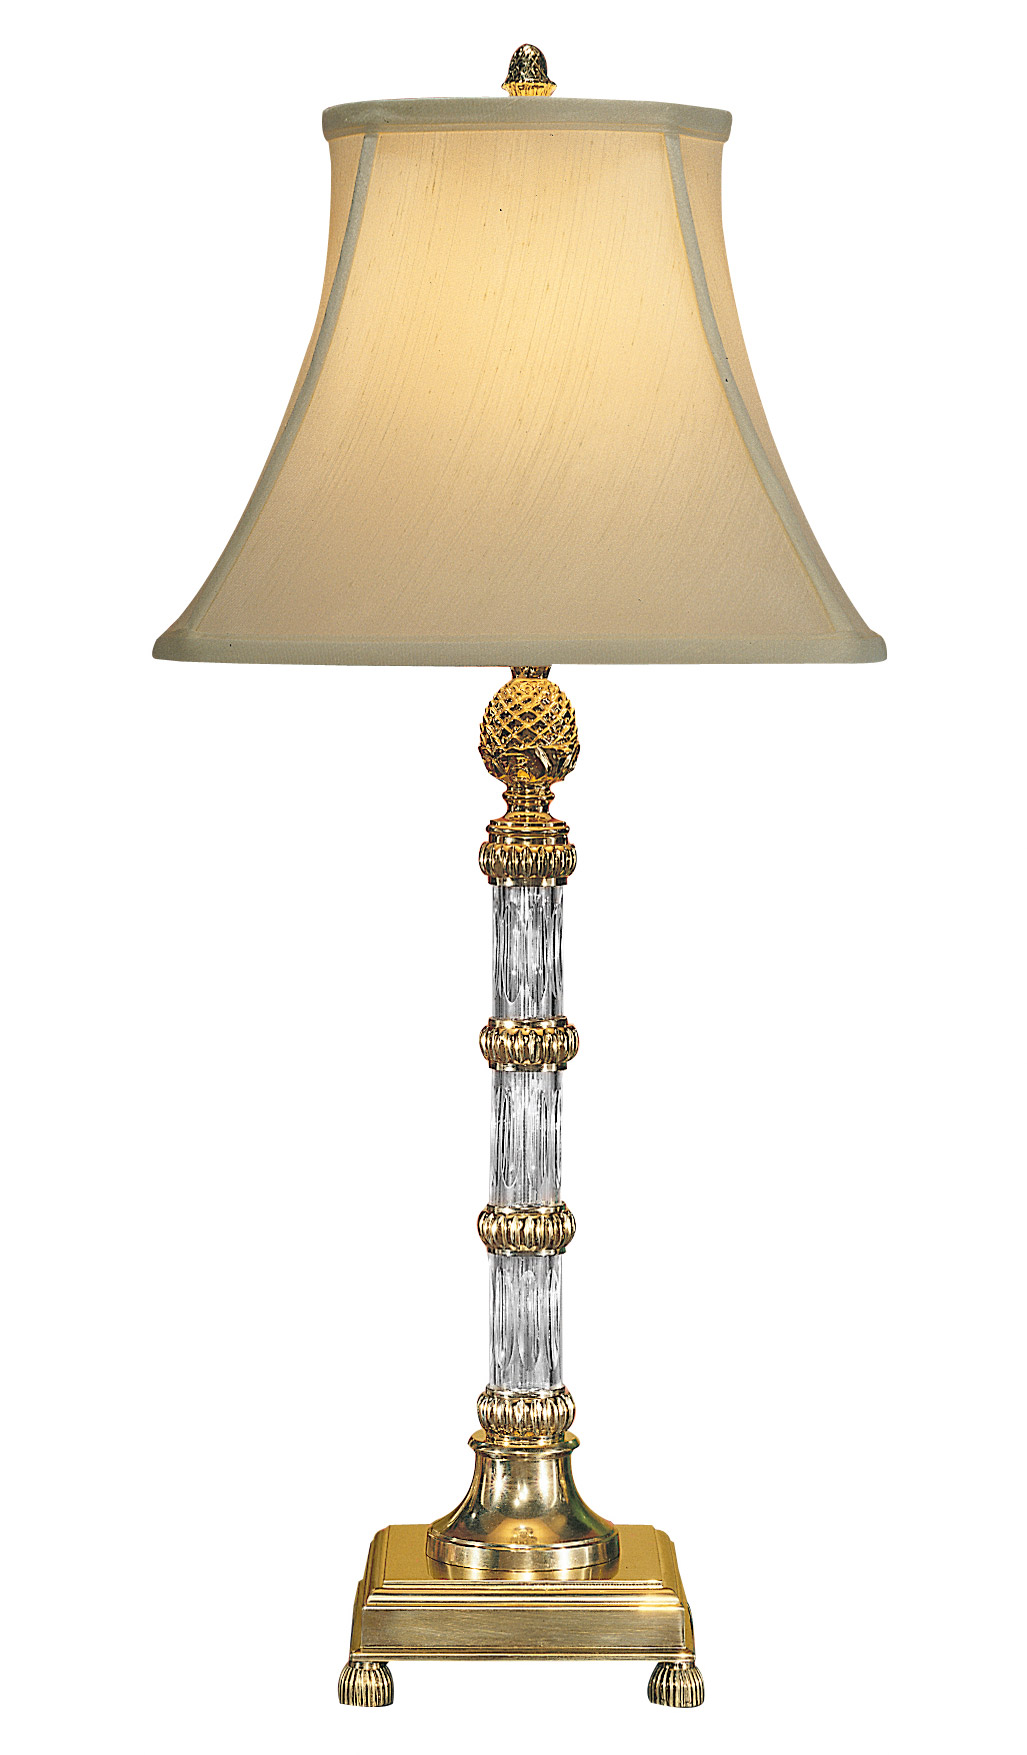 Wildwood 8121 Crystal Pineapple Column Table Lamp